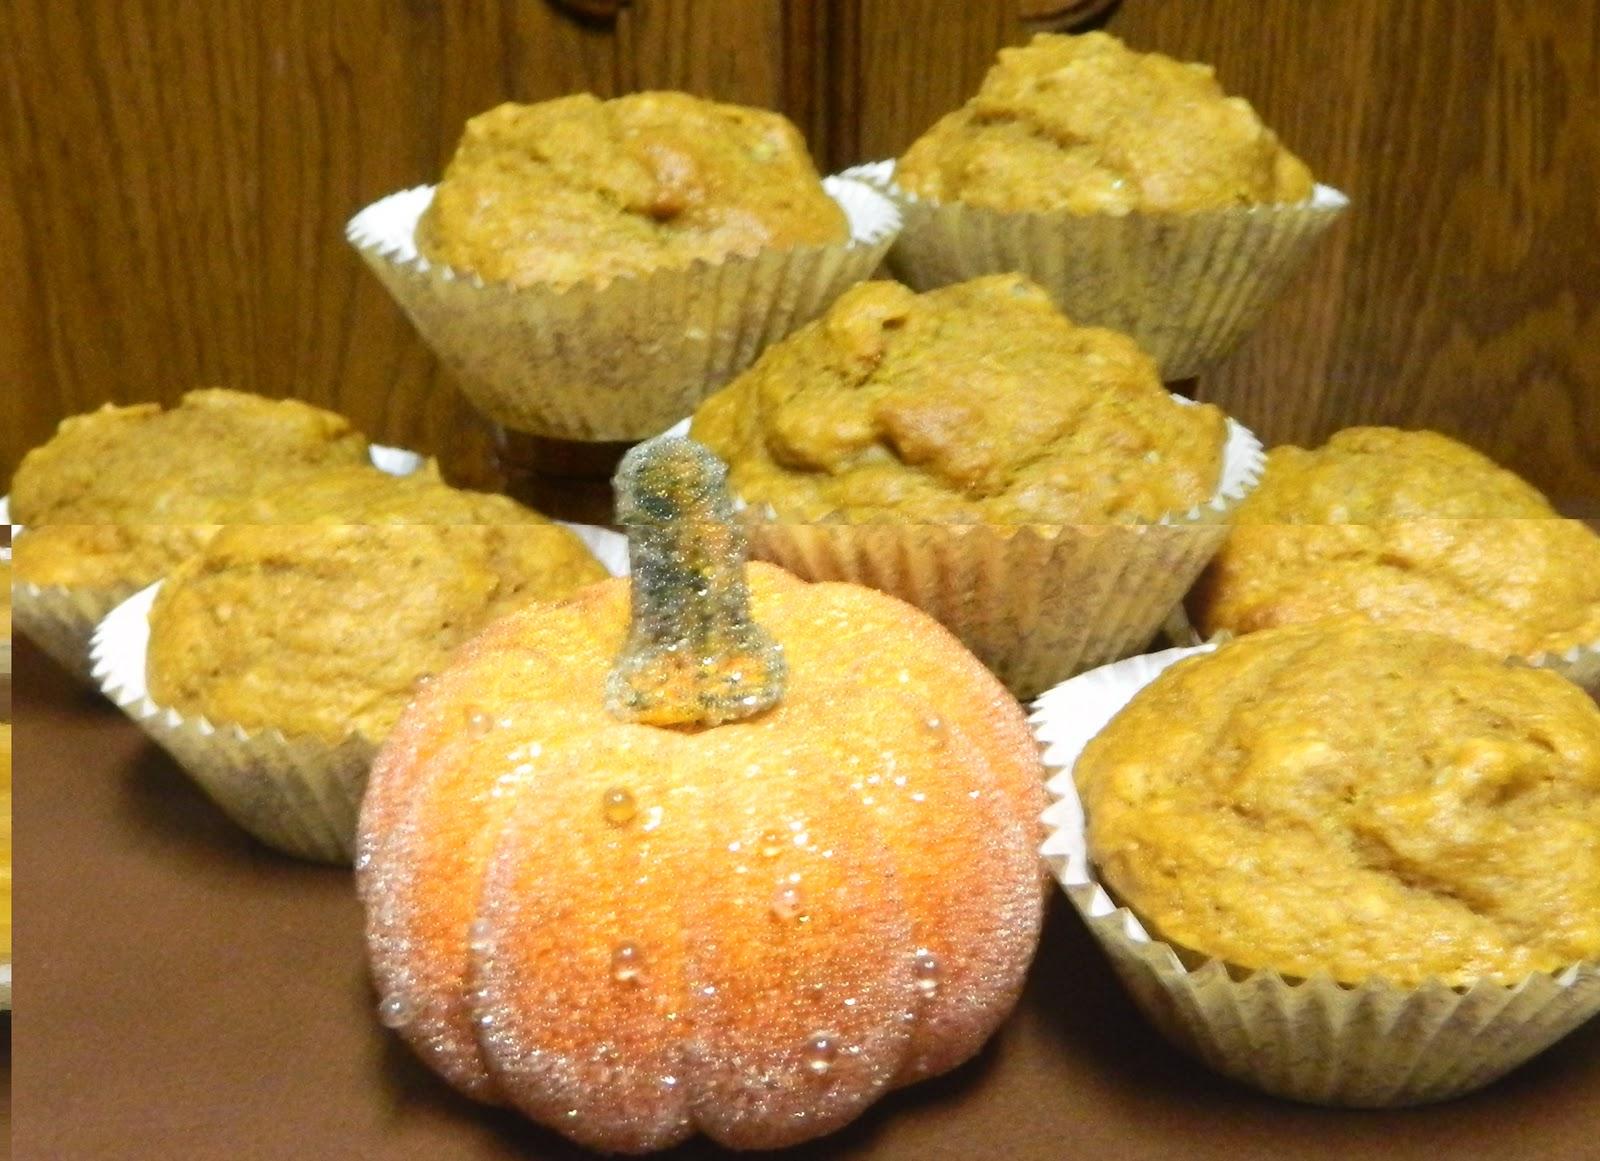 Sugar Spice and Spilled Milk: Pumpkin Nut Sourdough Muffins